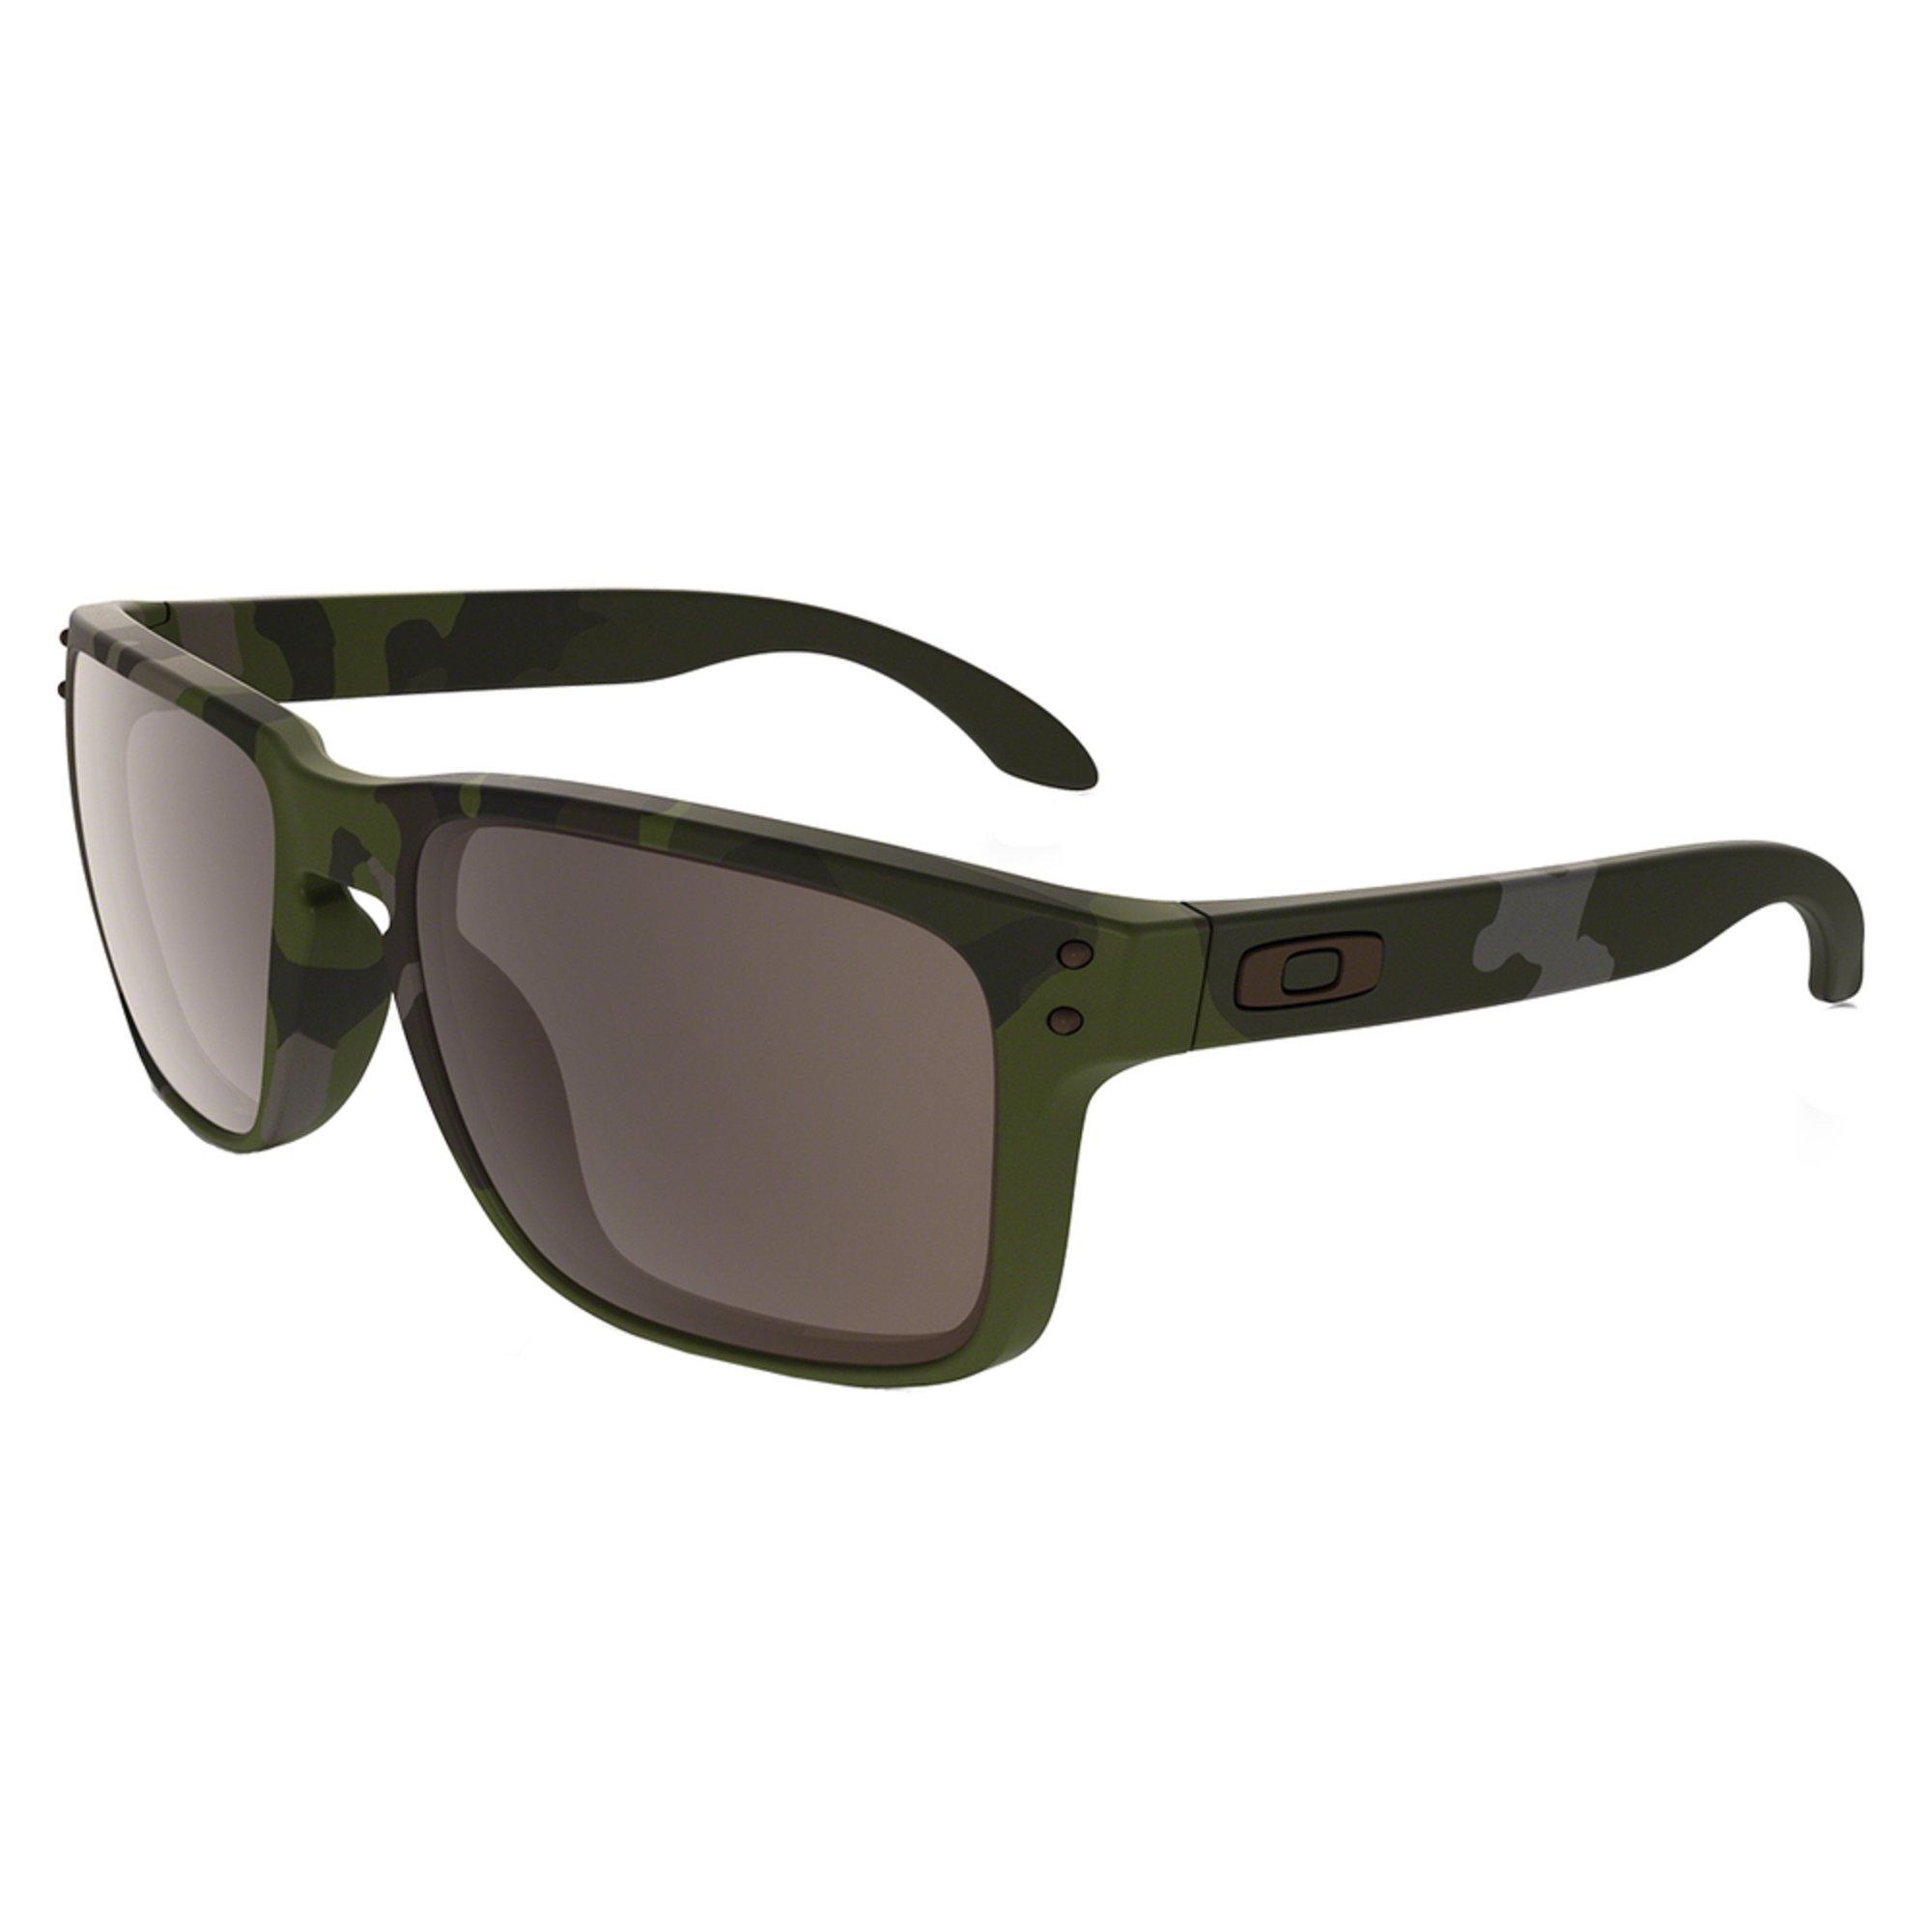 images oakley tactical sunglasses for men